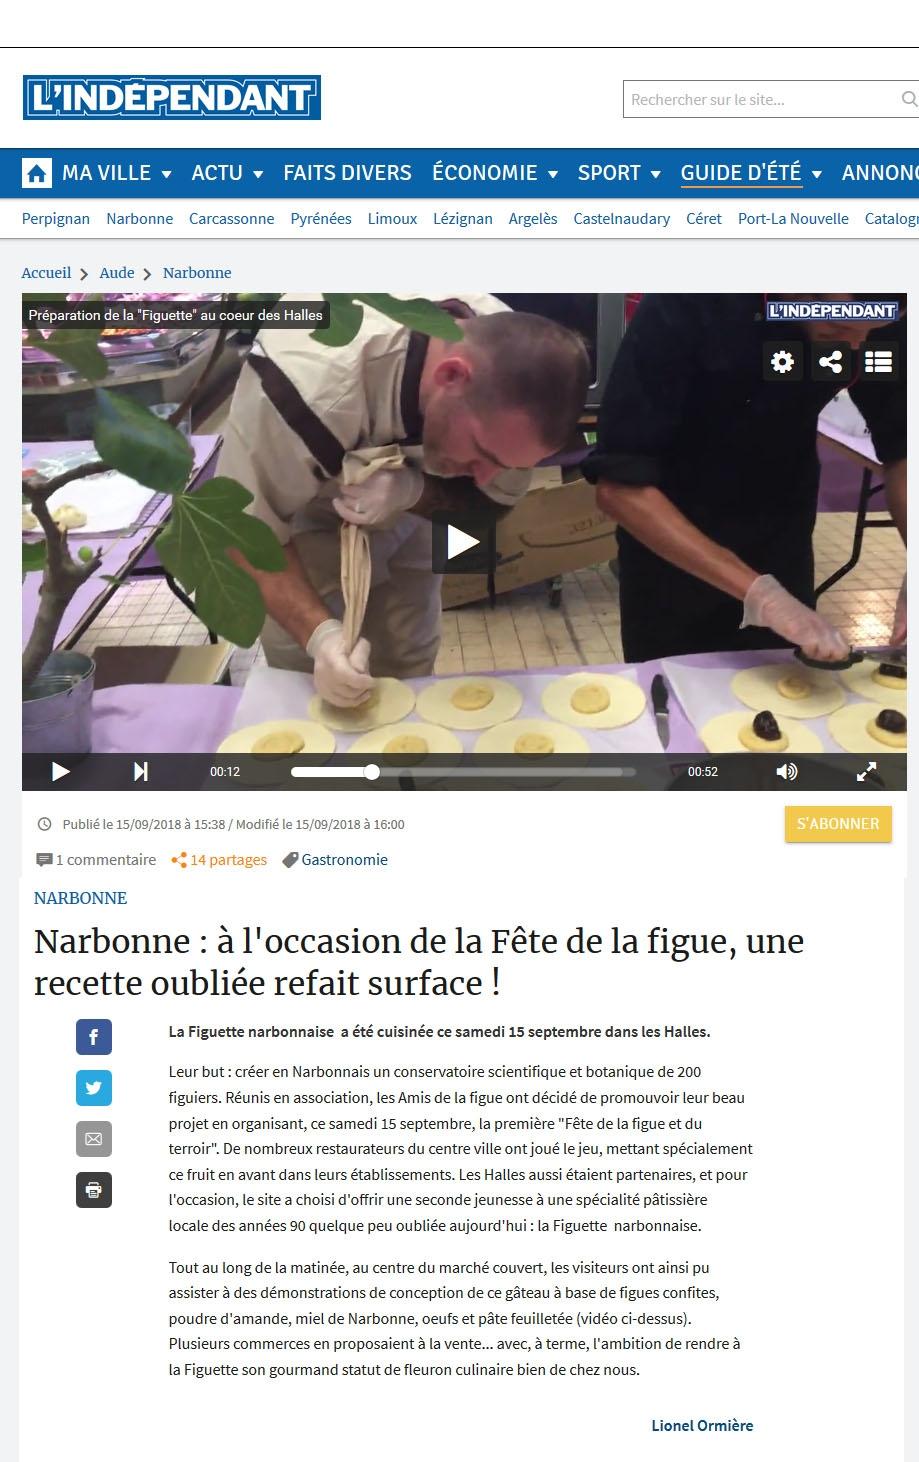 halles_narbonne_fete_figuette_independant_17-09-2018